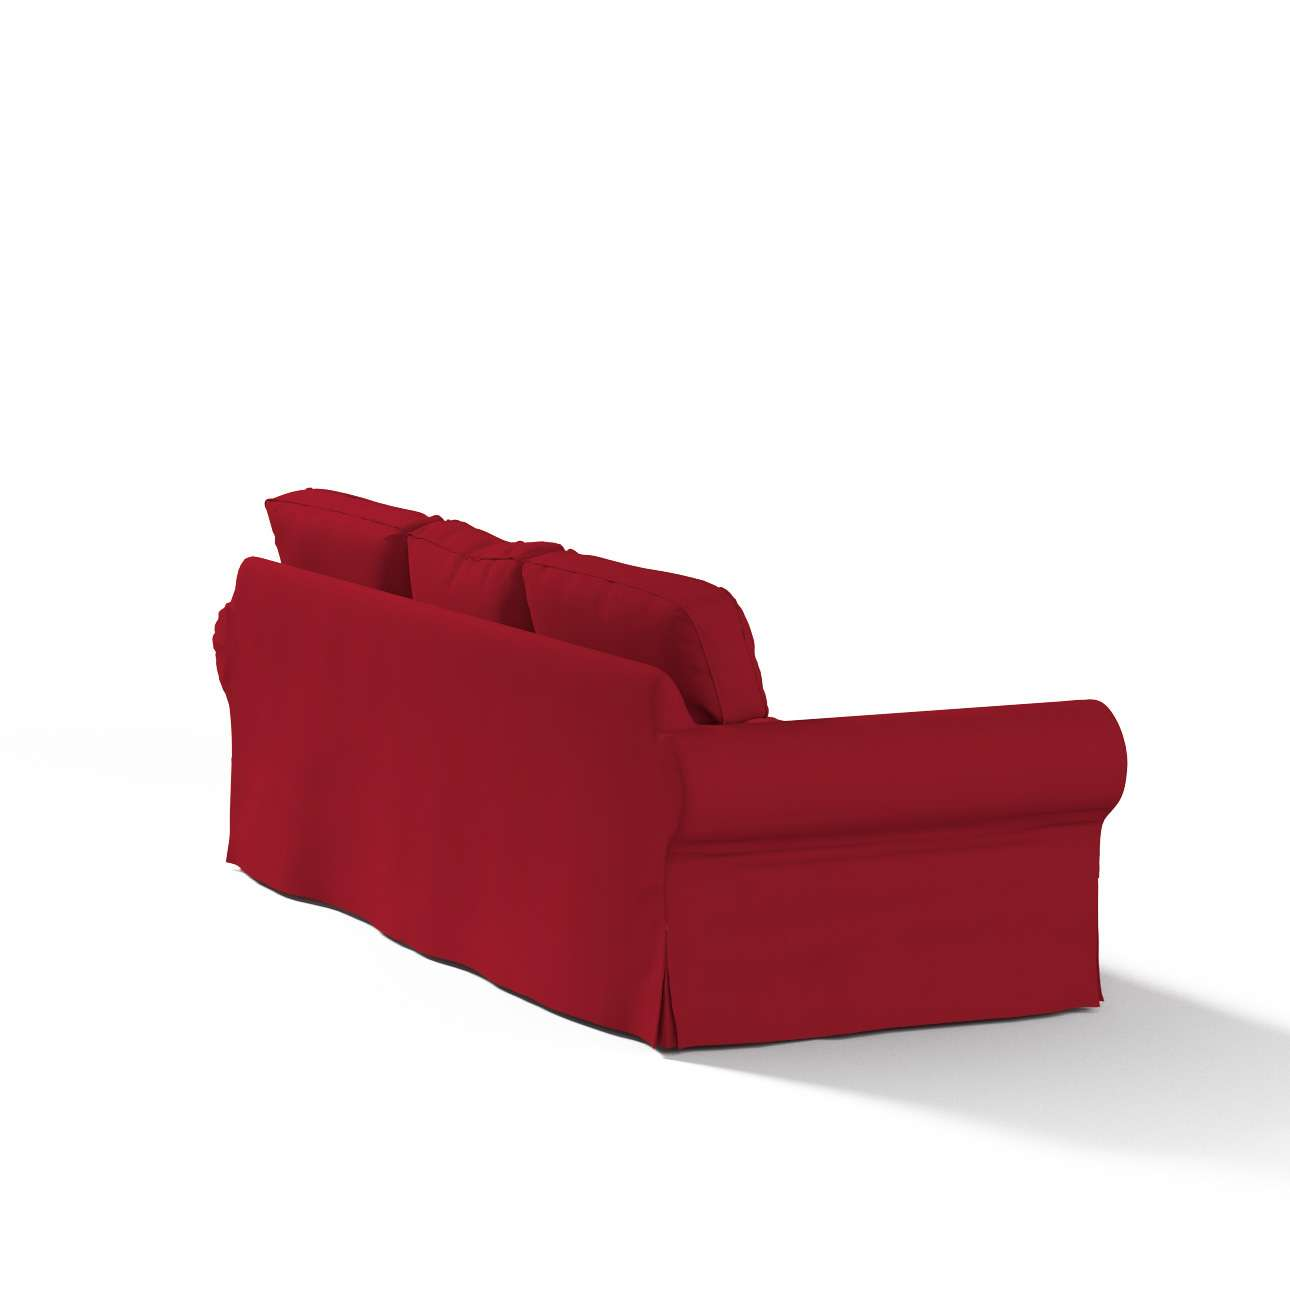 Ektorp 3-Sitzer Schlafsofabezug, ALTES Modell Sofahusse Ektorp 3-Sitzer Schlafsofa von der Kollektion Chenille , Stoff: 702-24